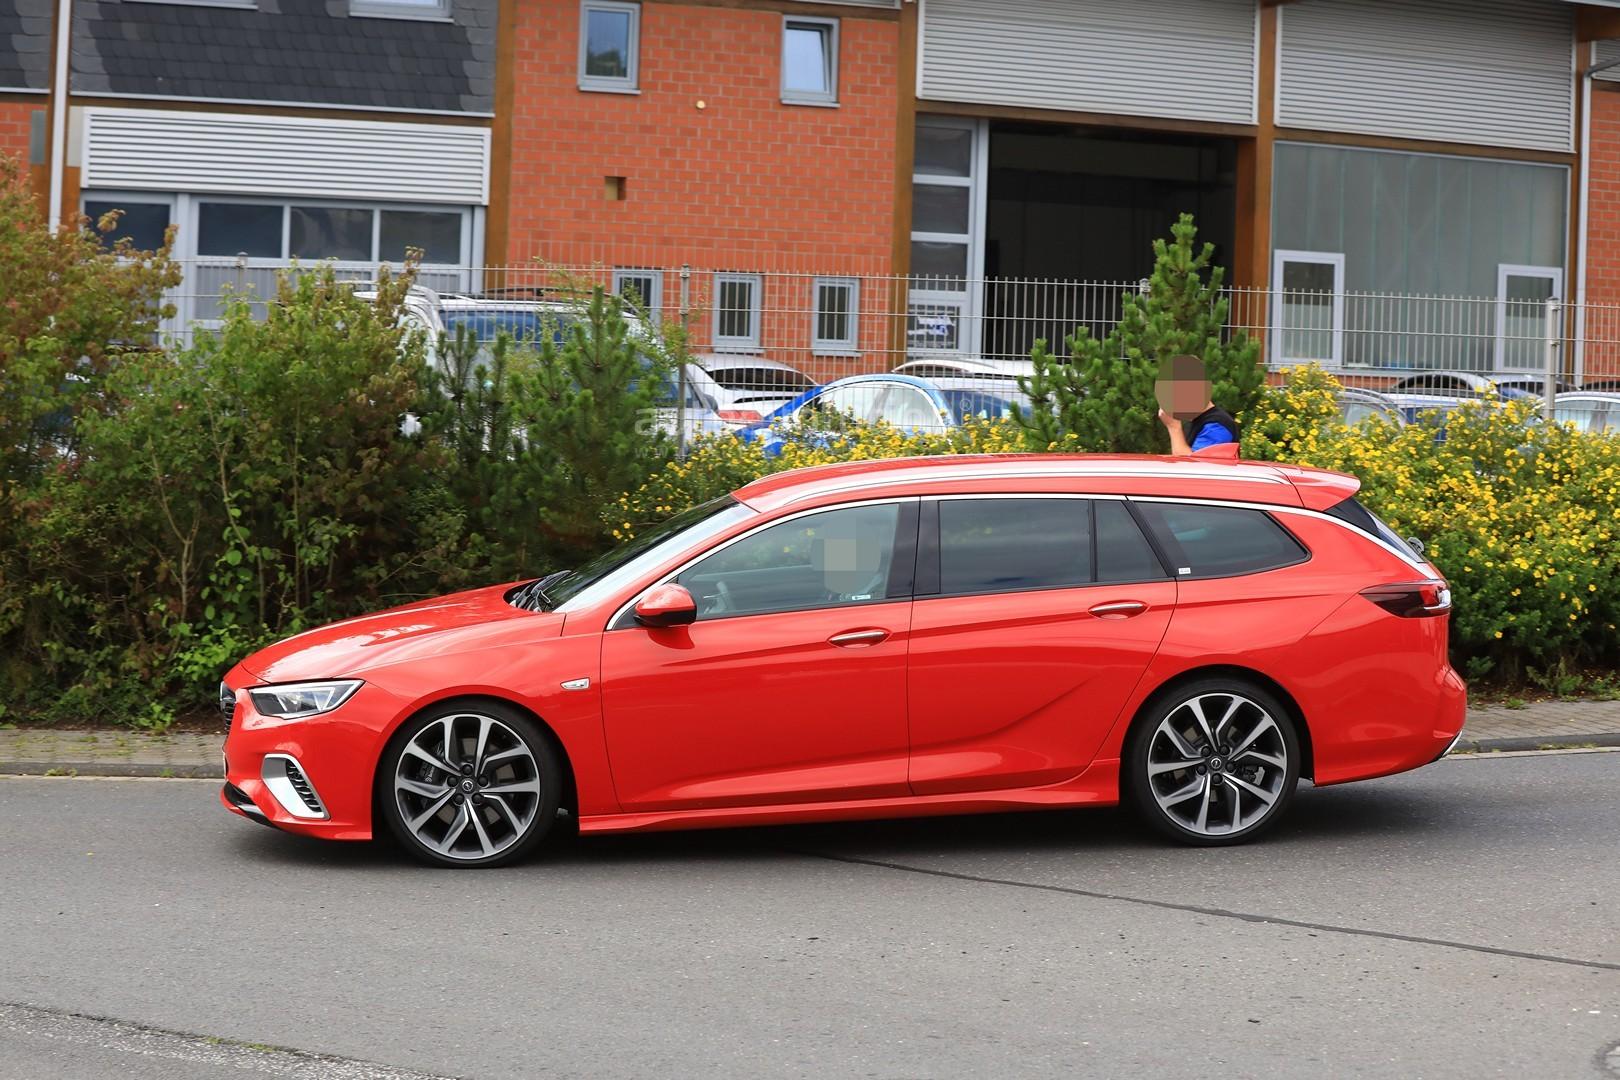 Opel Gt For Sale >> Spyshots: 2018 Opel Insignia GSi Wagon Drops Disguise - autoevolution